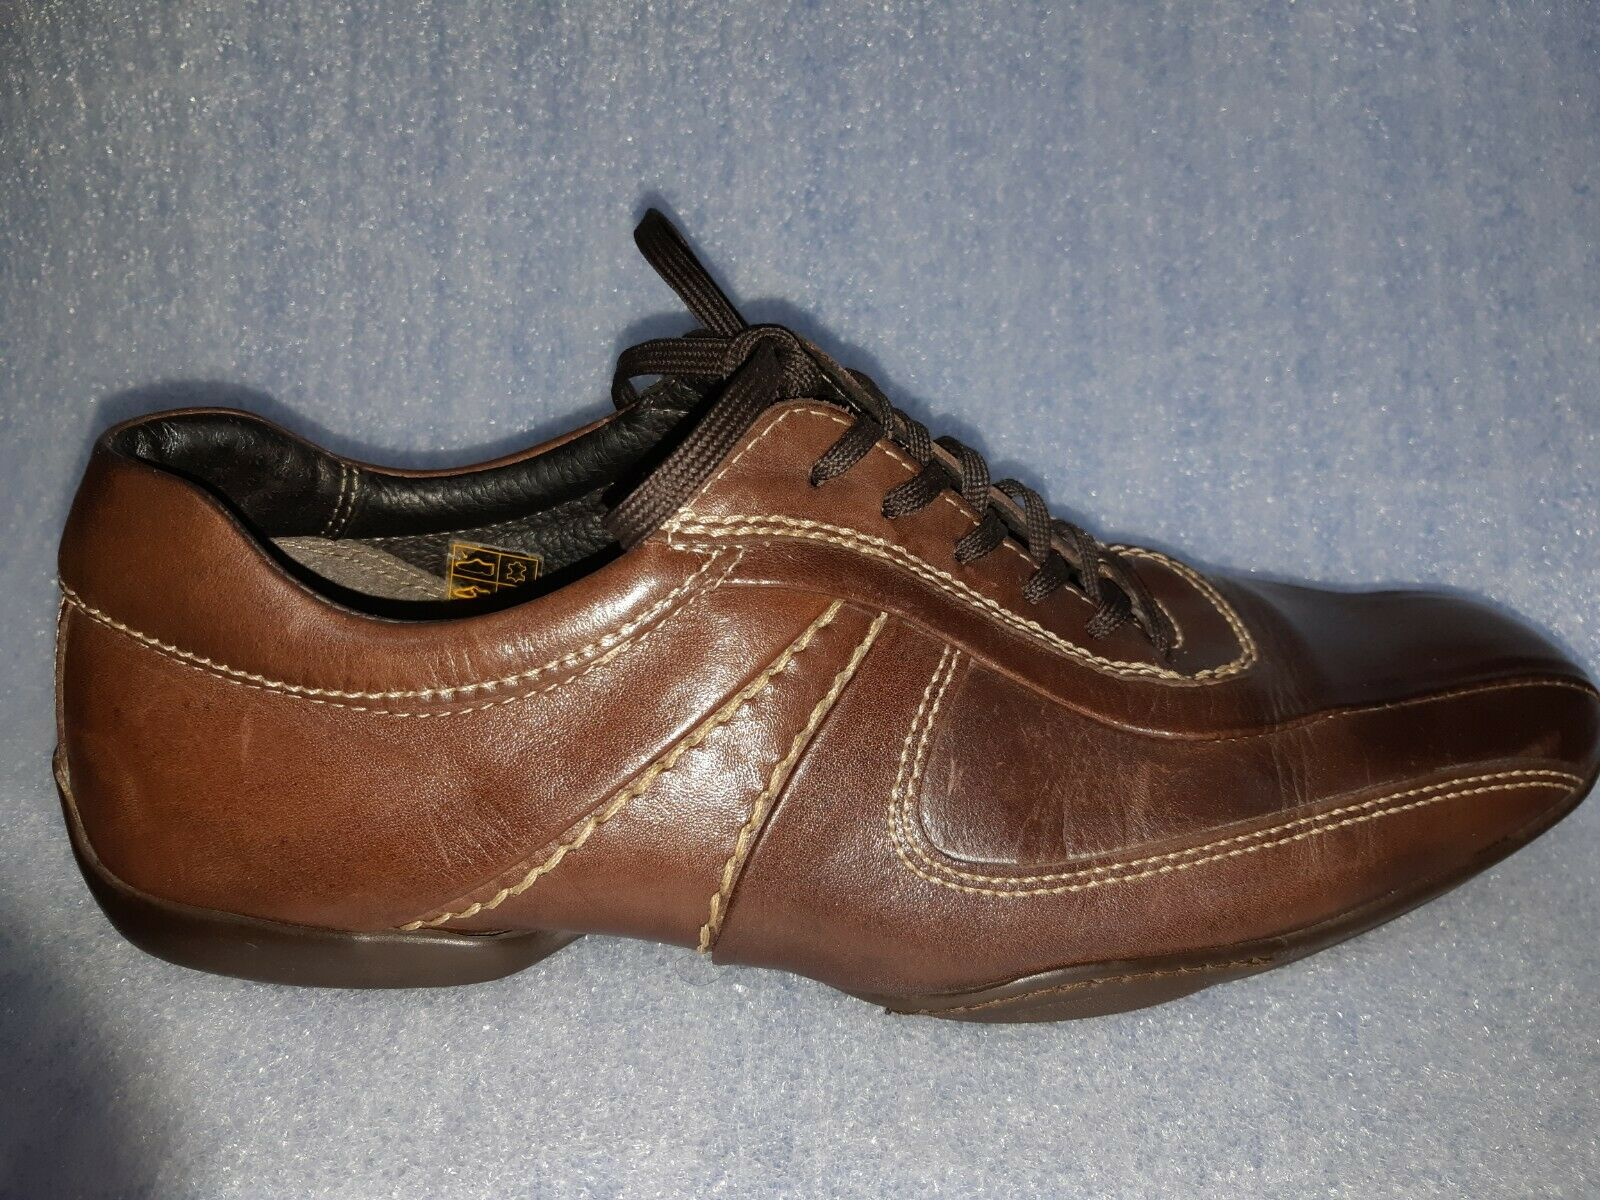 Carven Paris France mens scarpe  Marroneee pizzi su Snickers Dimensione EUR 43 US 10.  vendita scontata online di factory outlet